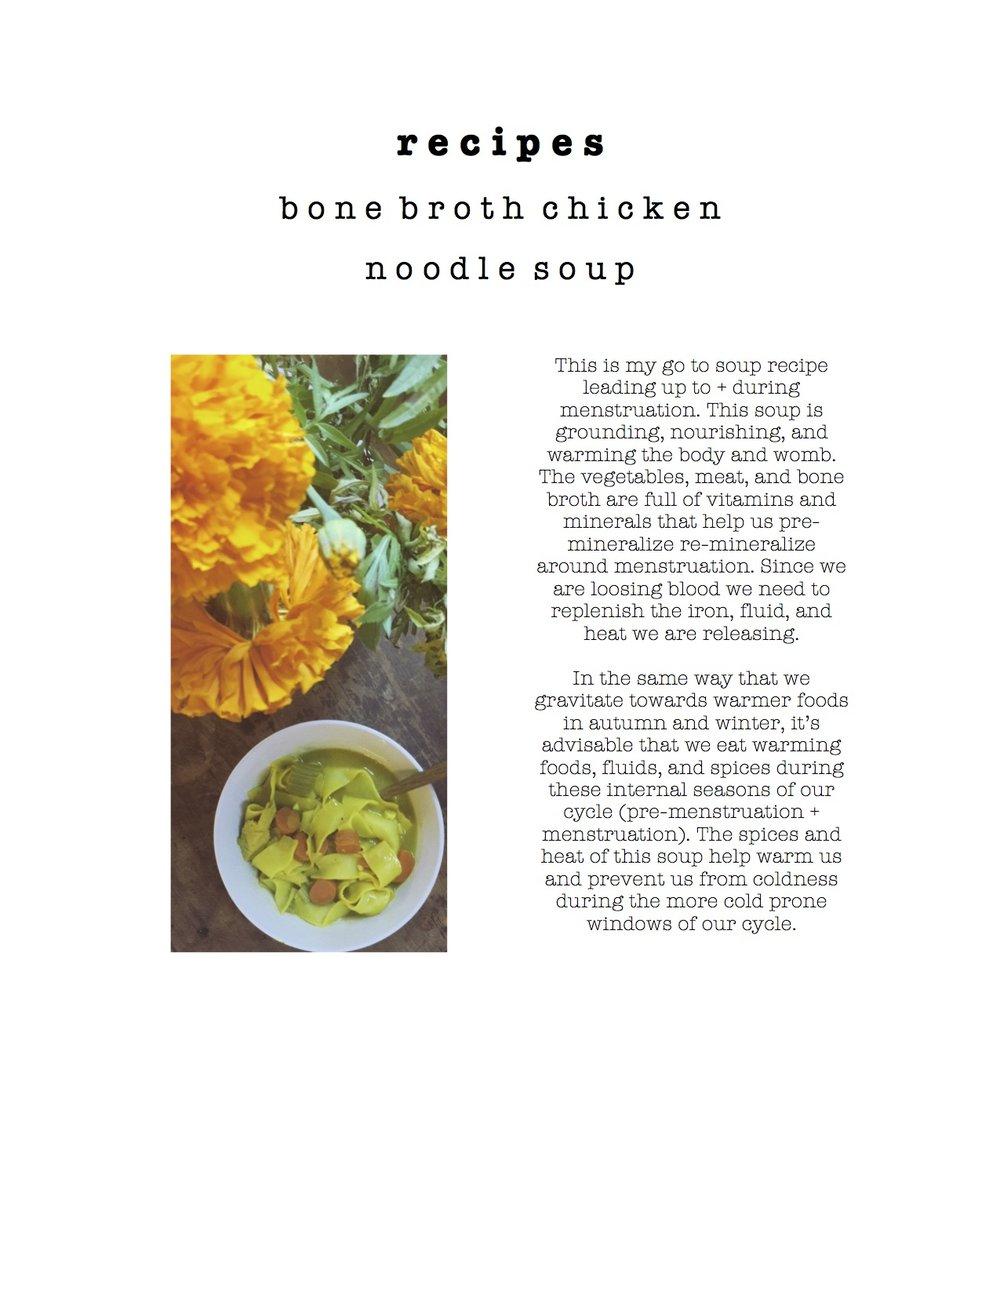 recipies autumn pg 1.jpg